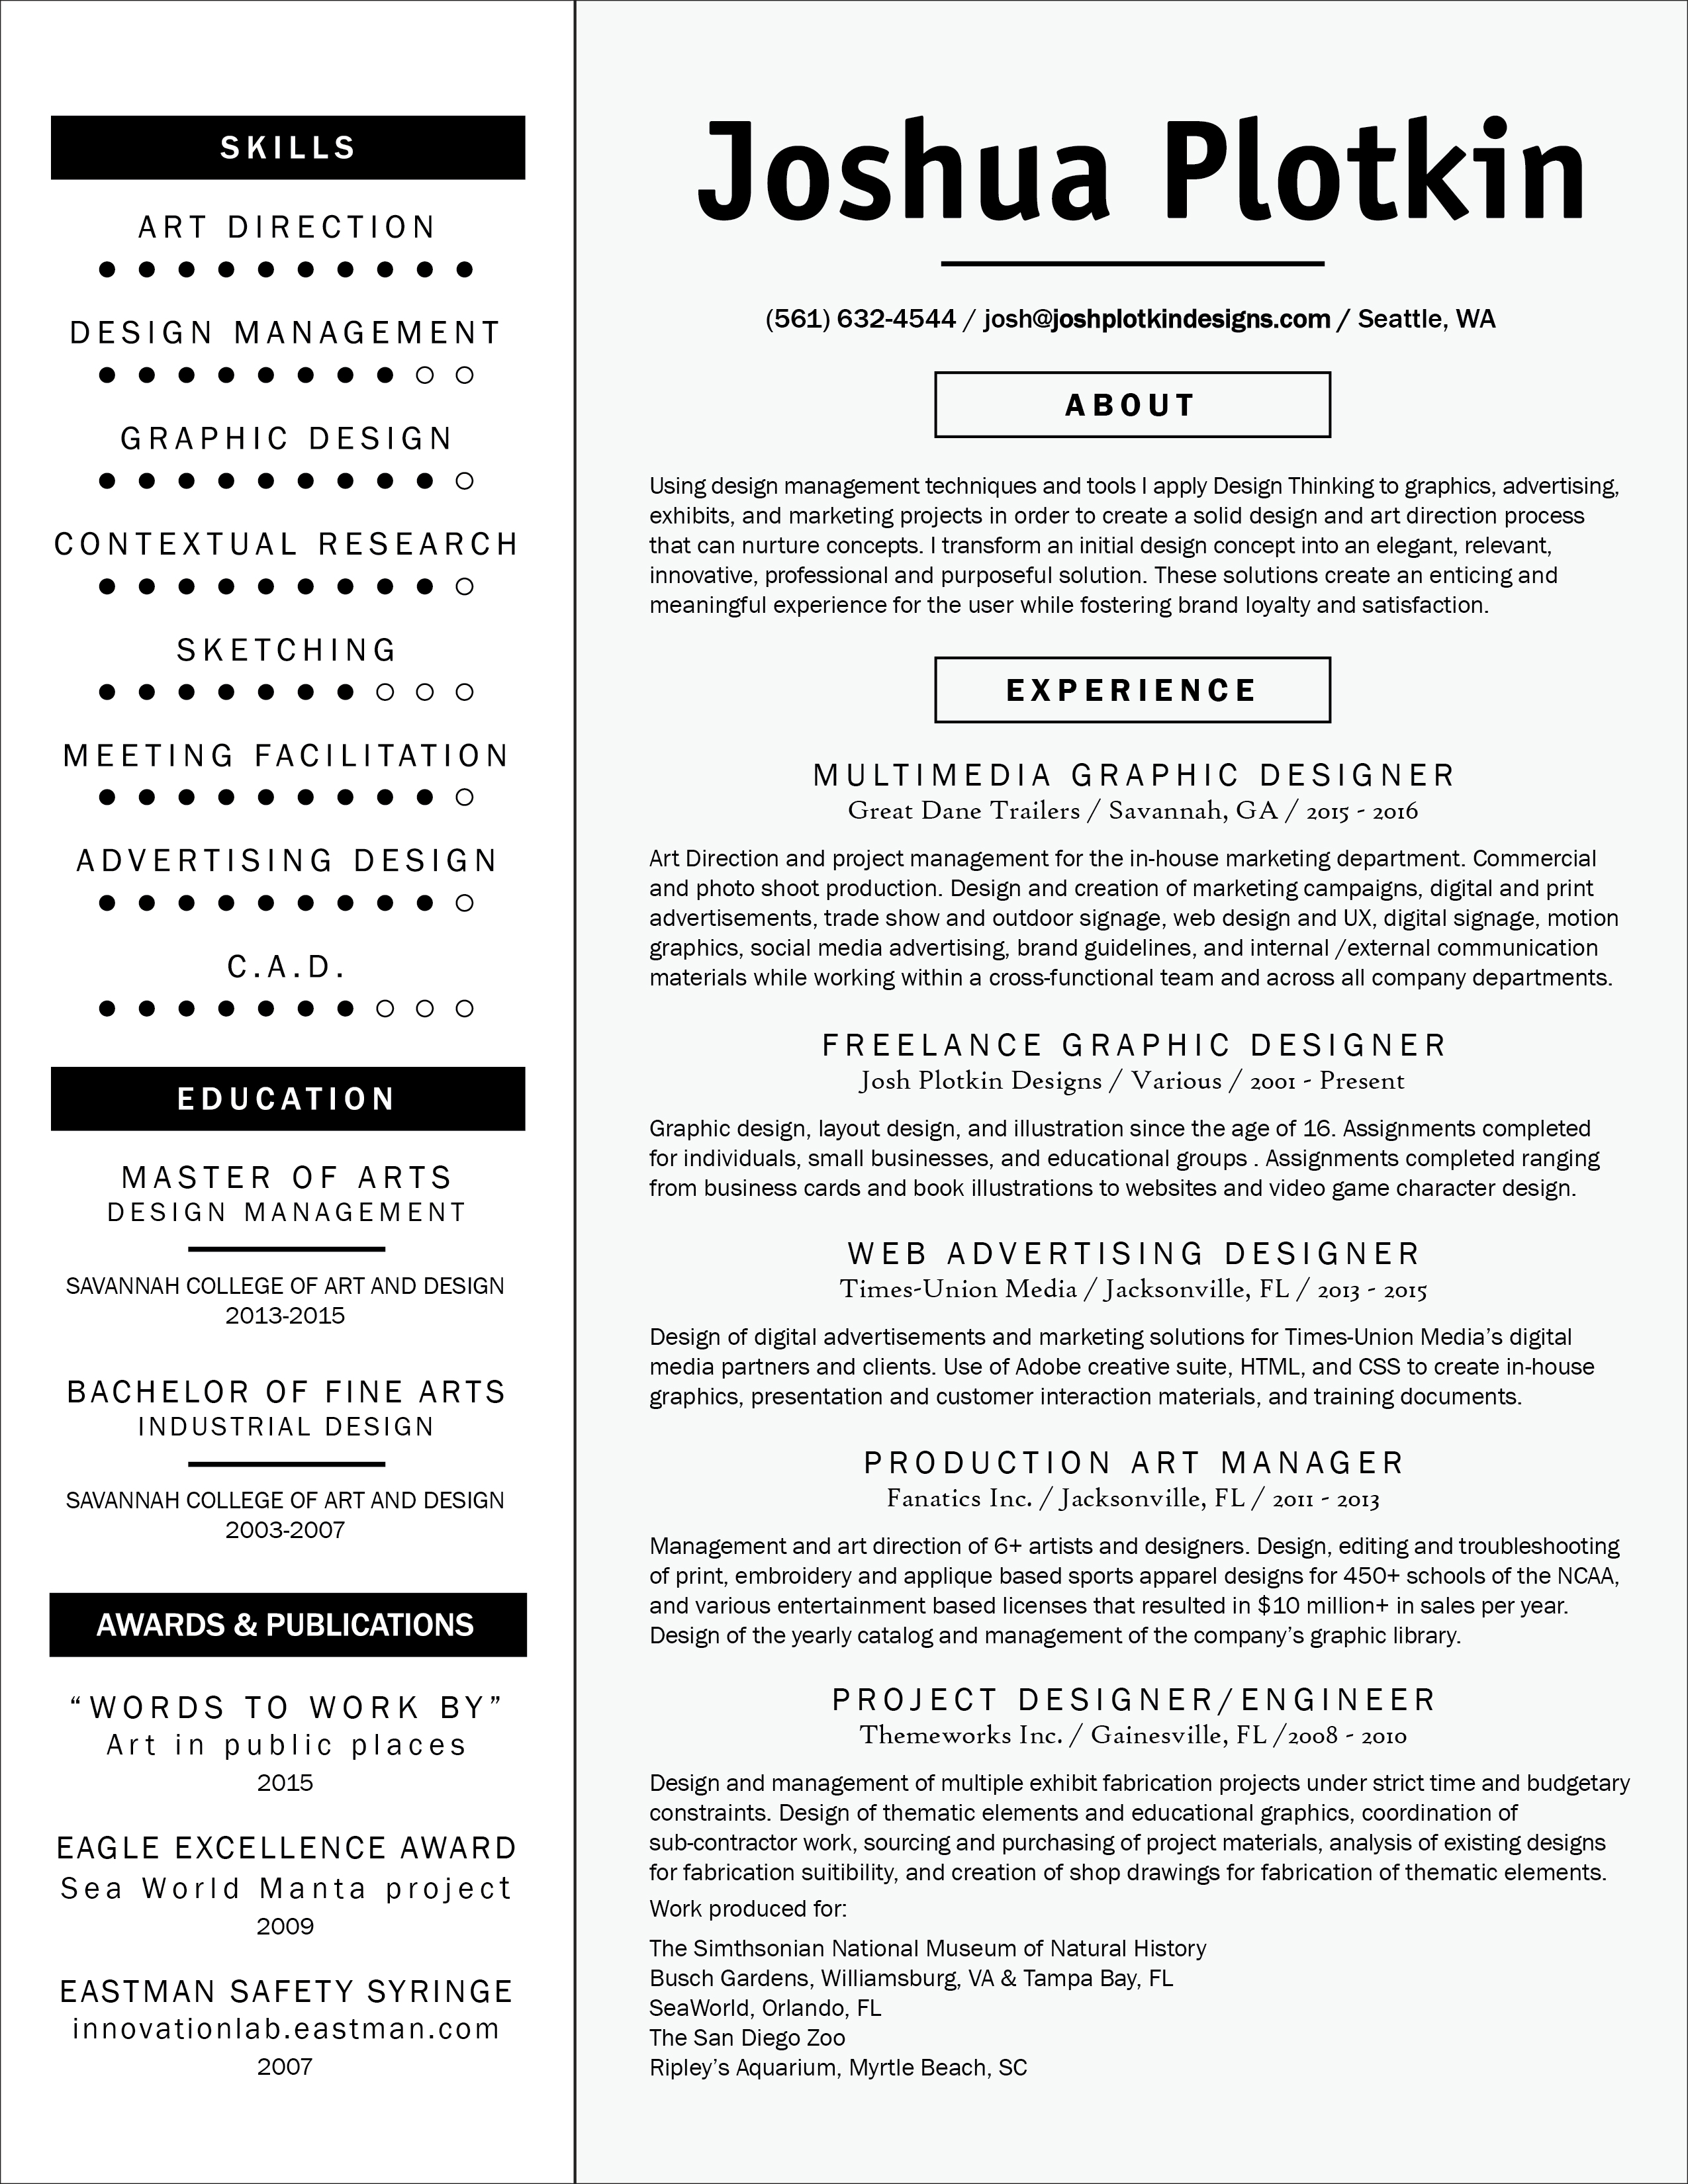 Joshua Plotkin's Resume